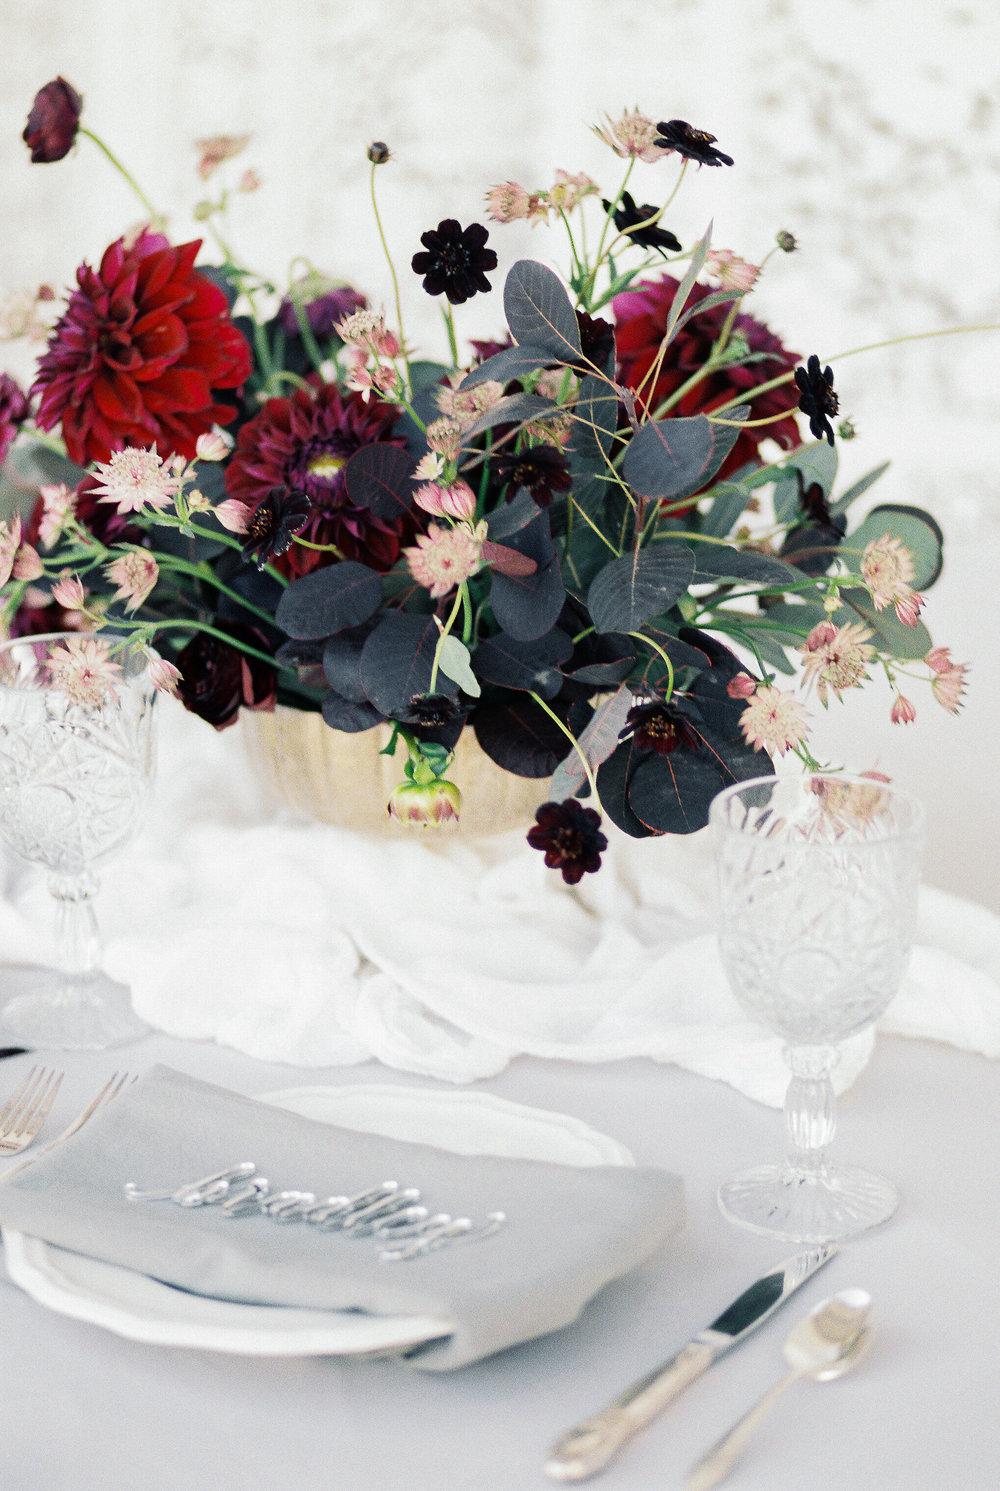 Georgia-Ruth-Photography-Flat-Lays-Table-Details-57.jpg